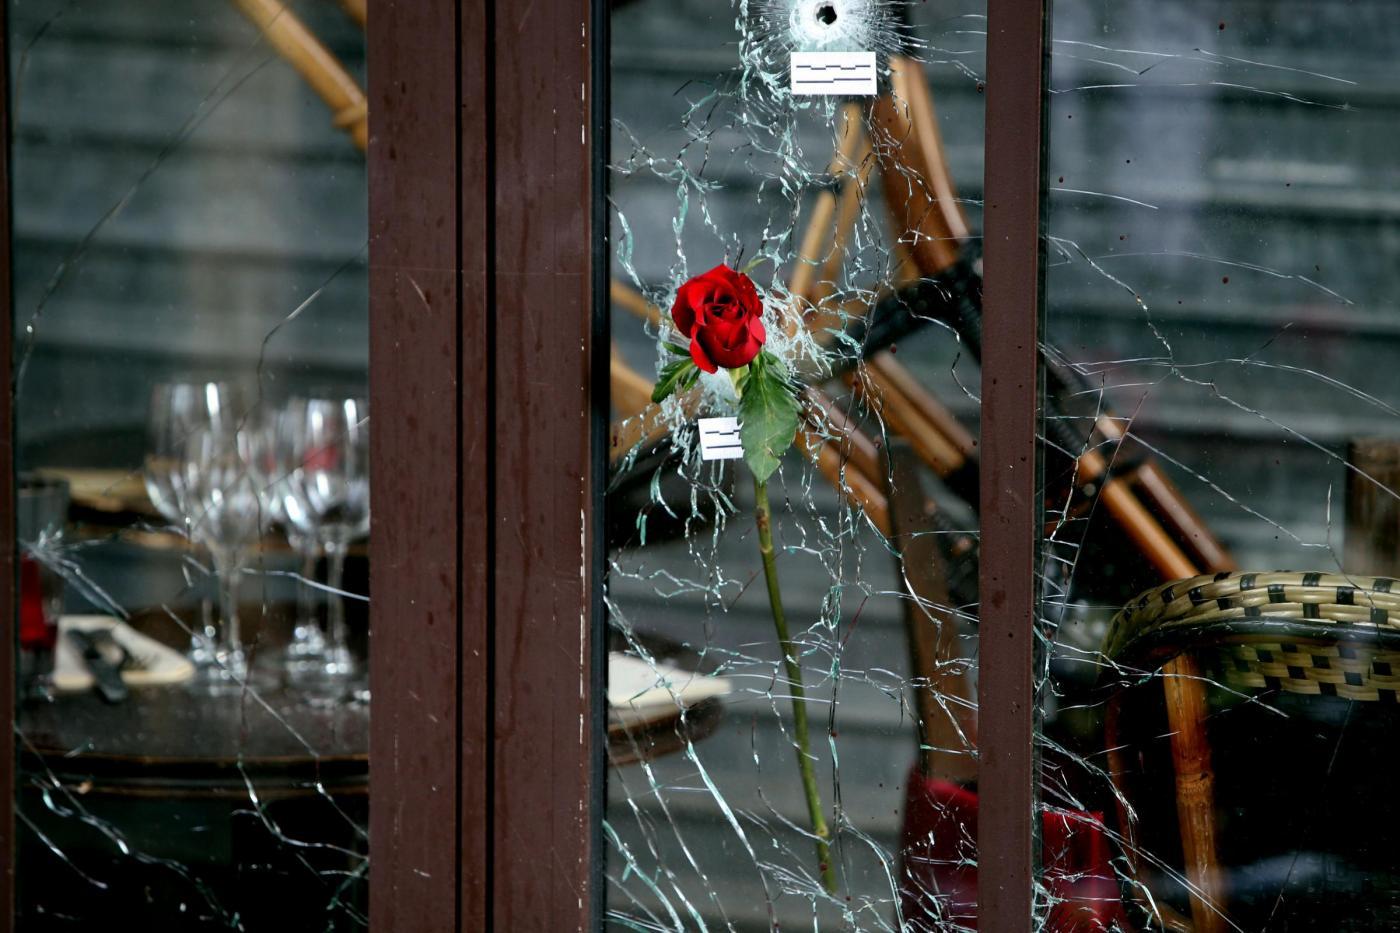 Attentati a Parigi 2015 - testimonianze